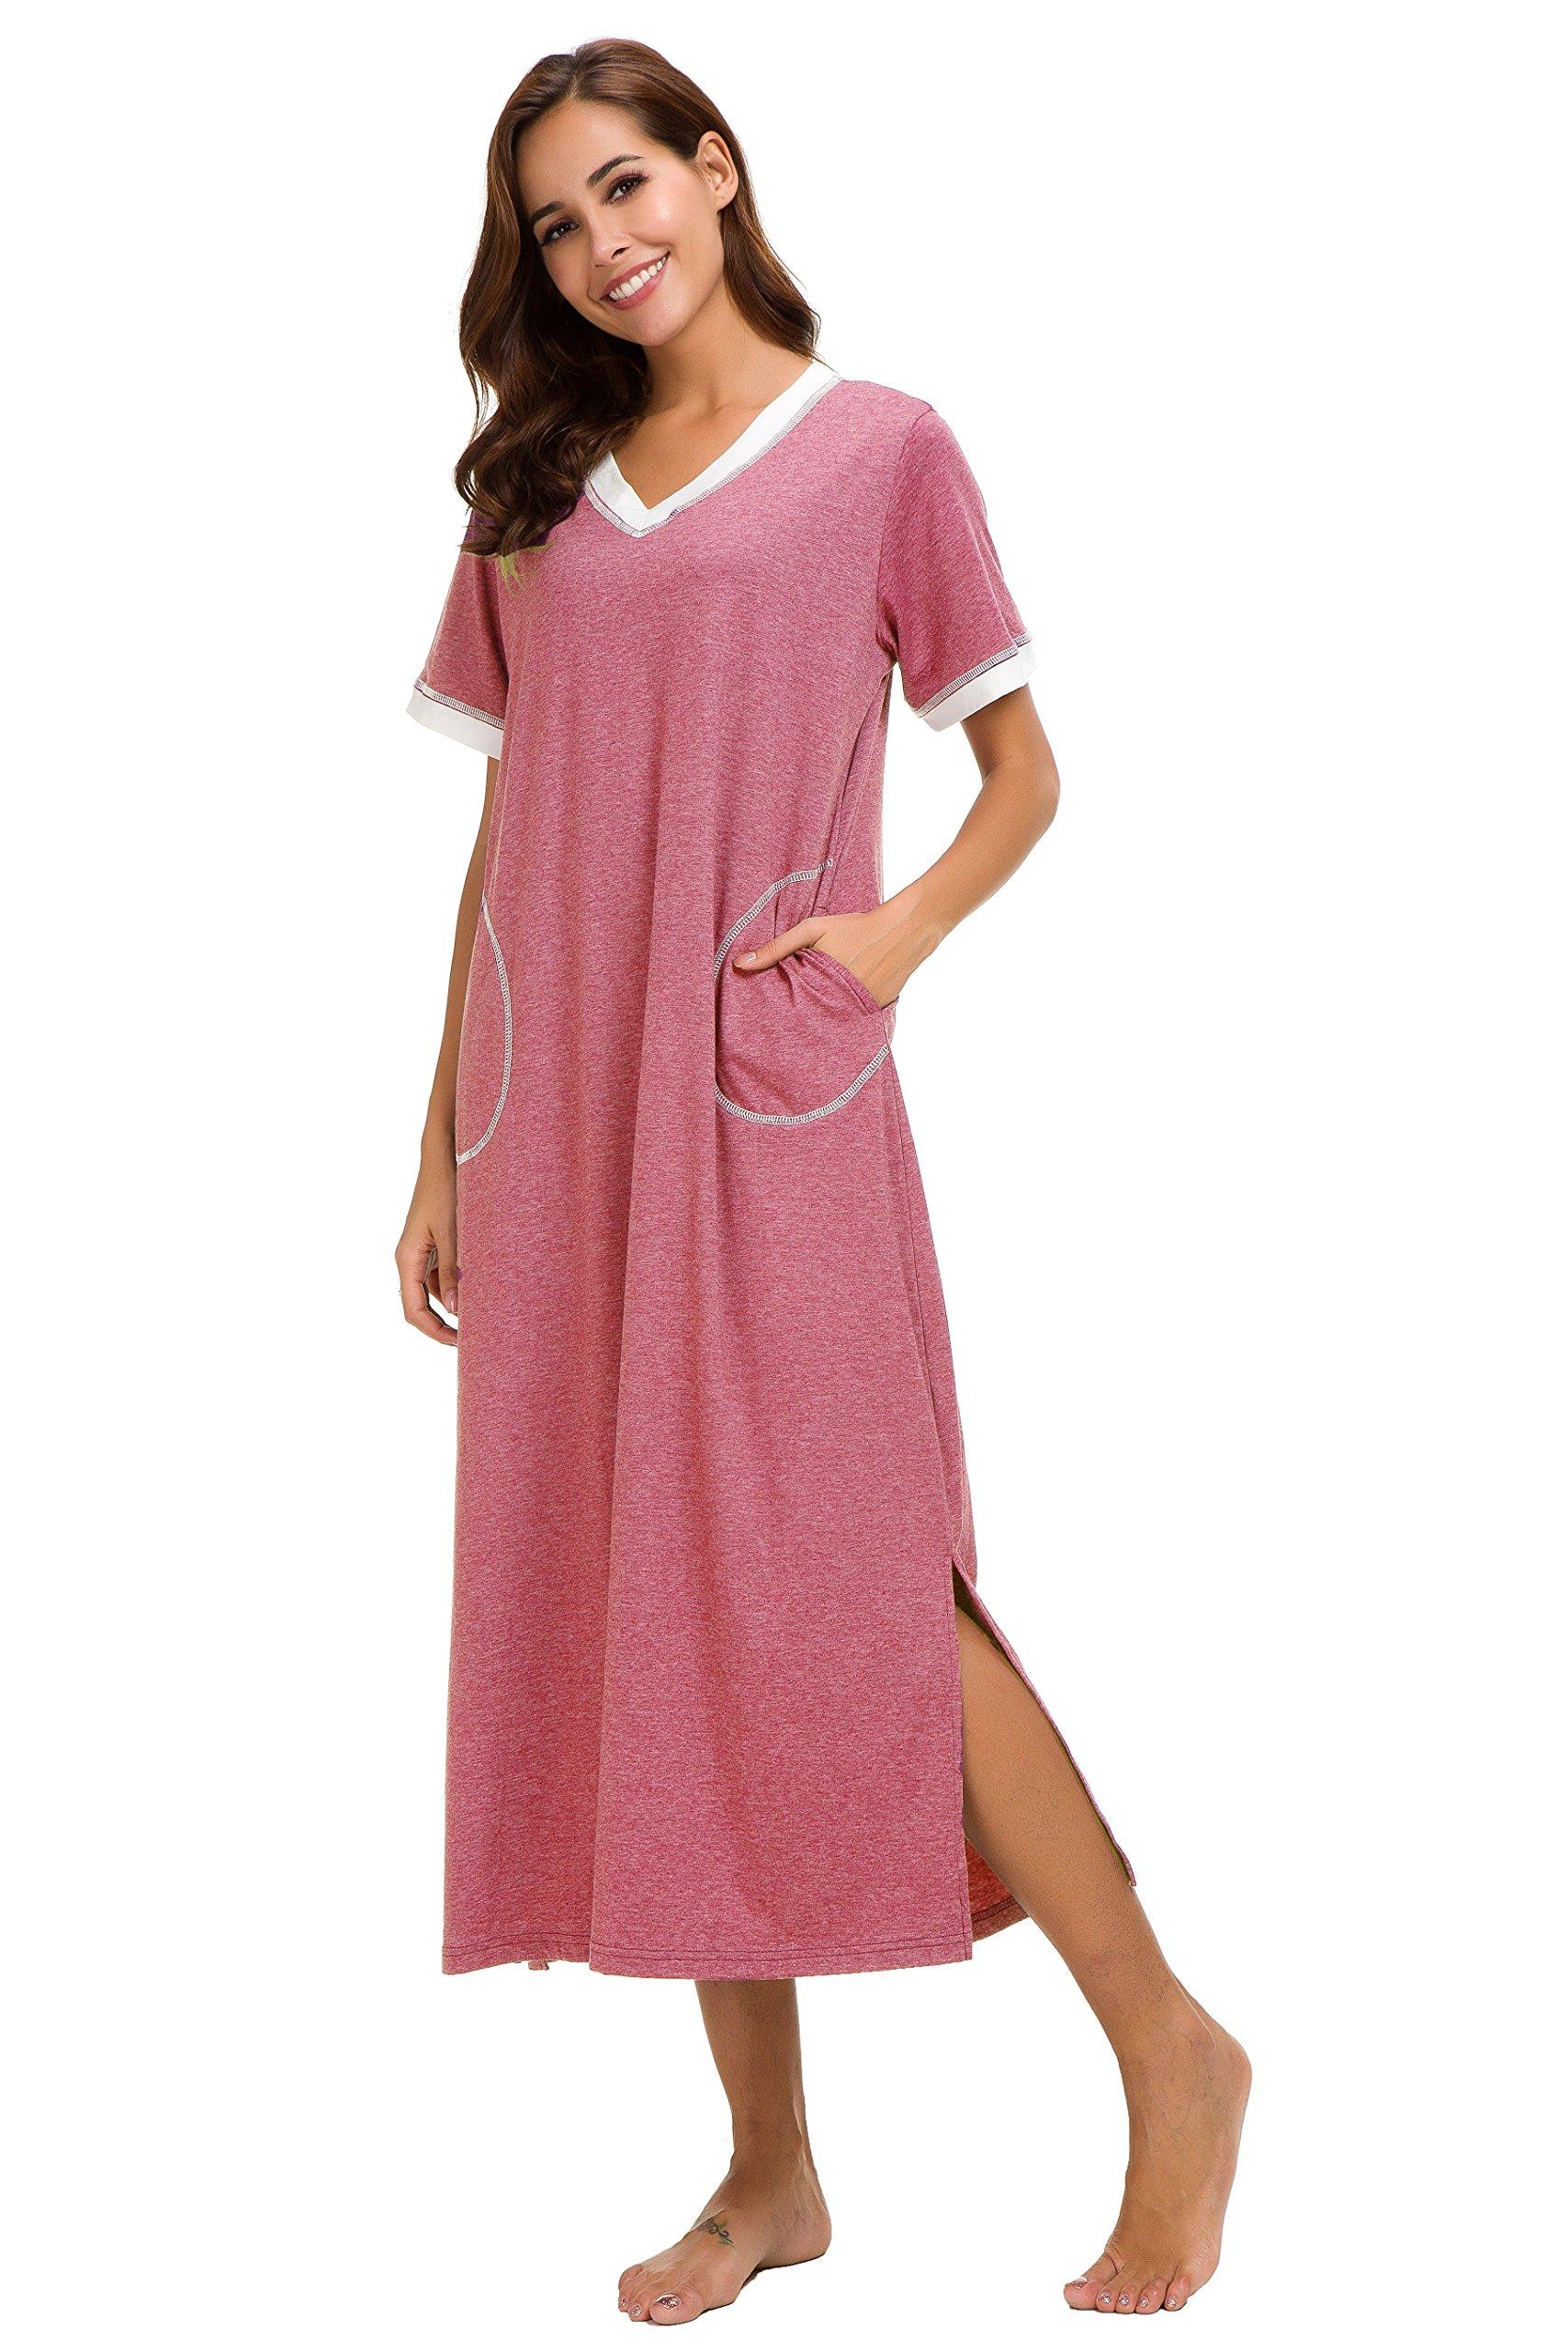 Aviier Supersoft Maxi Sleepshirt with Pockets, Nightgowns for Women Short Sleeve Cotton Nightshirts Sleepwear (XXL, Red) by Aviier (Image #3)